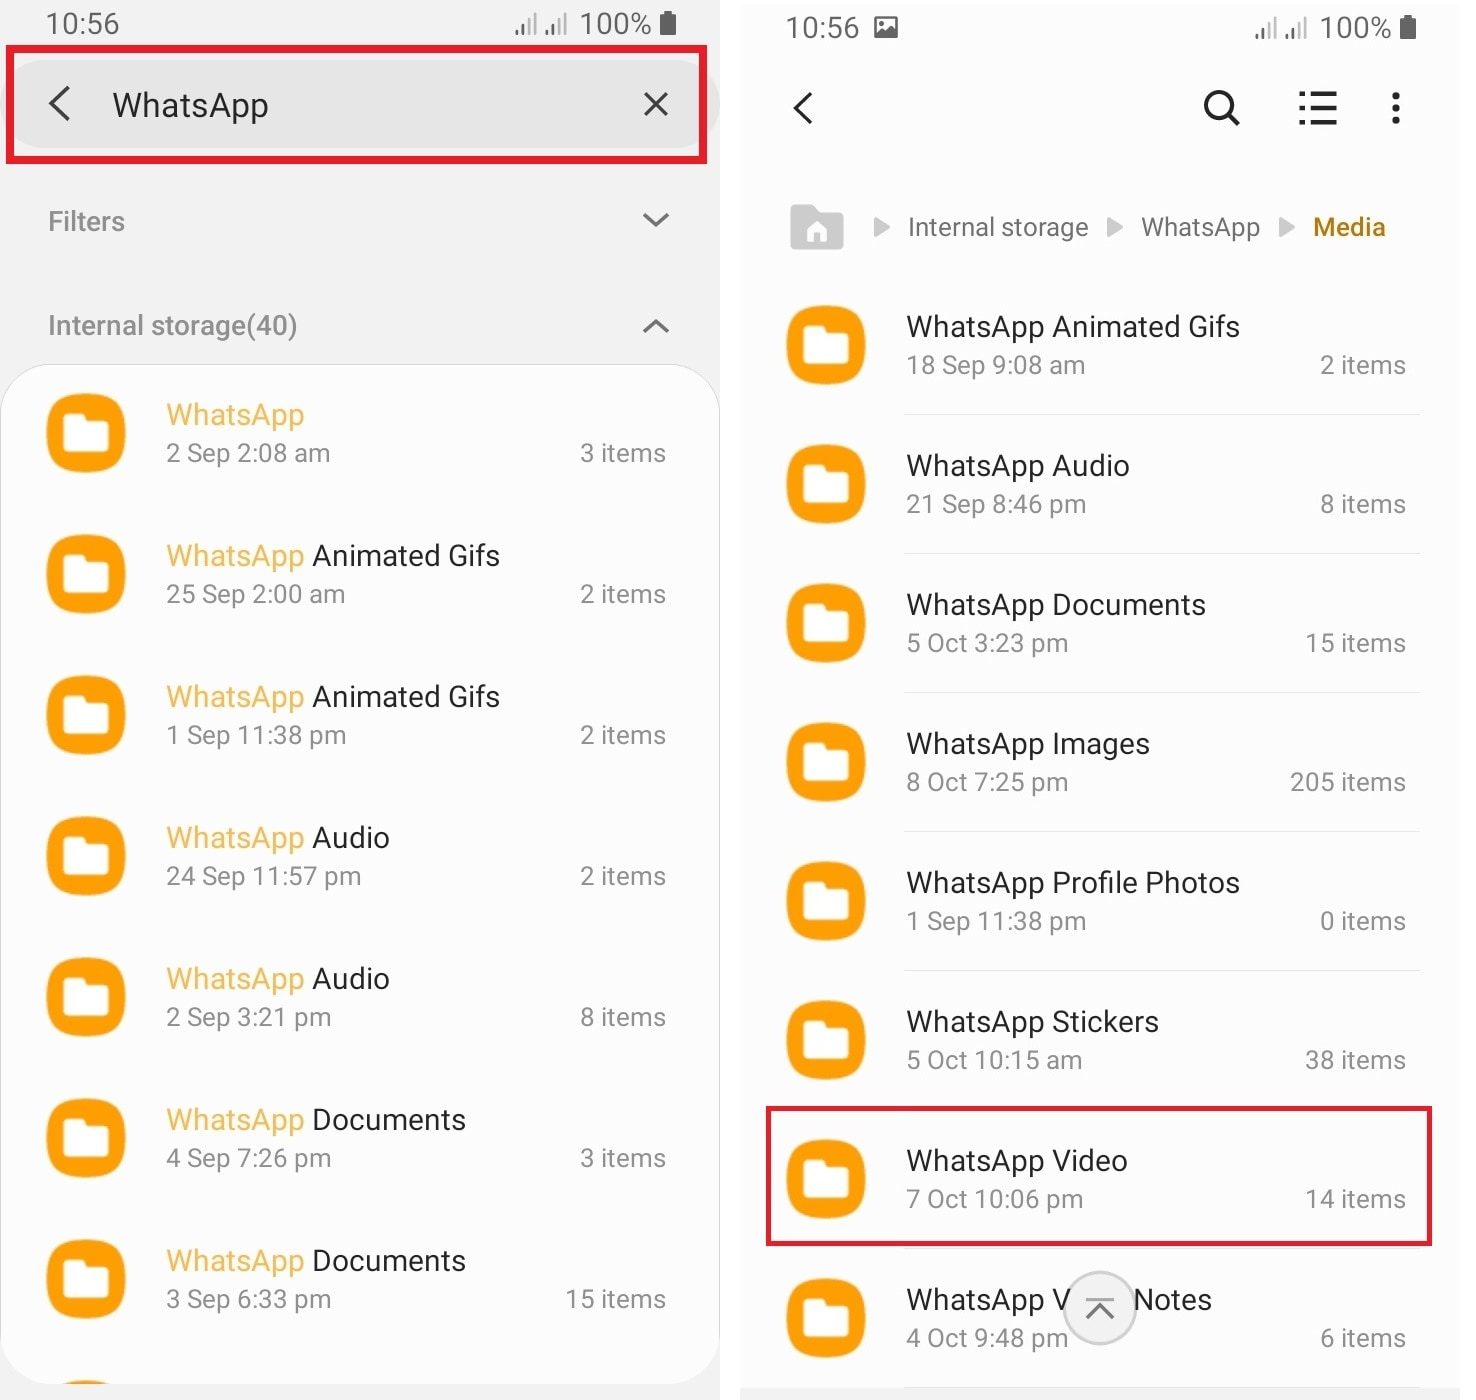 whatsapp folder in phone storage